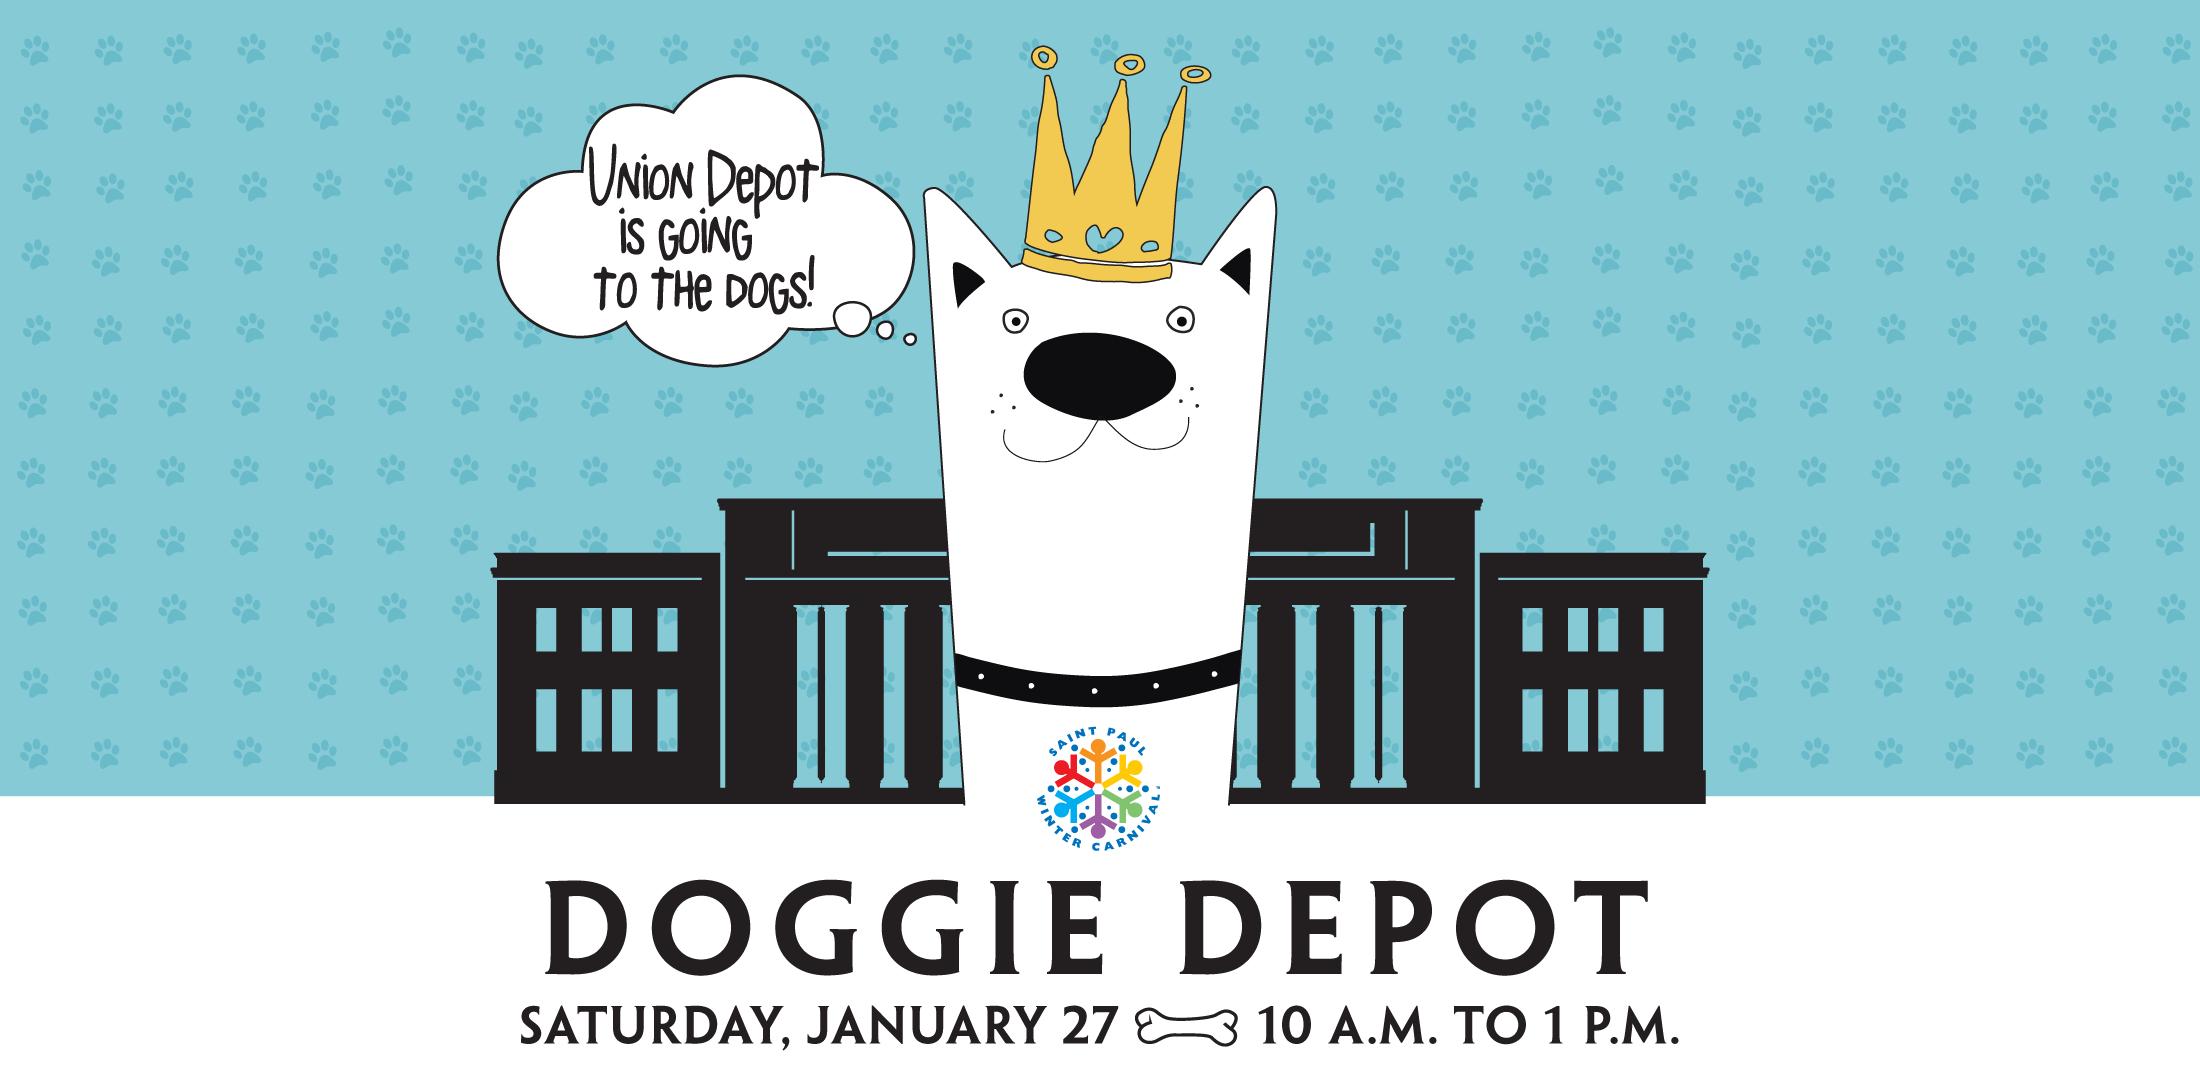 Snowball clipart winter carnival. Doggie depot saint paul